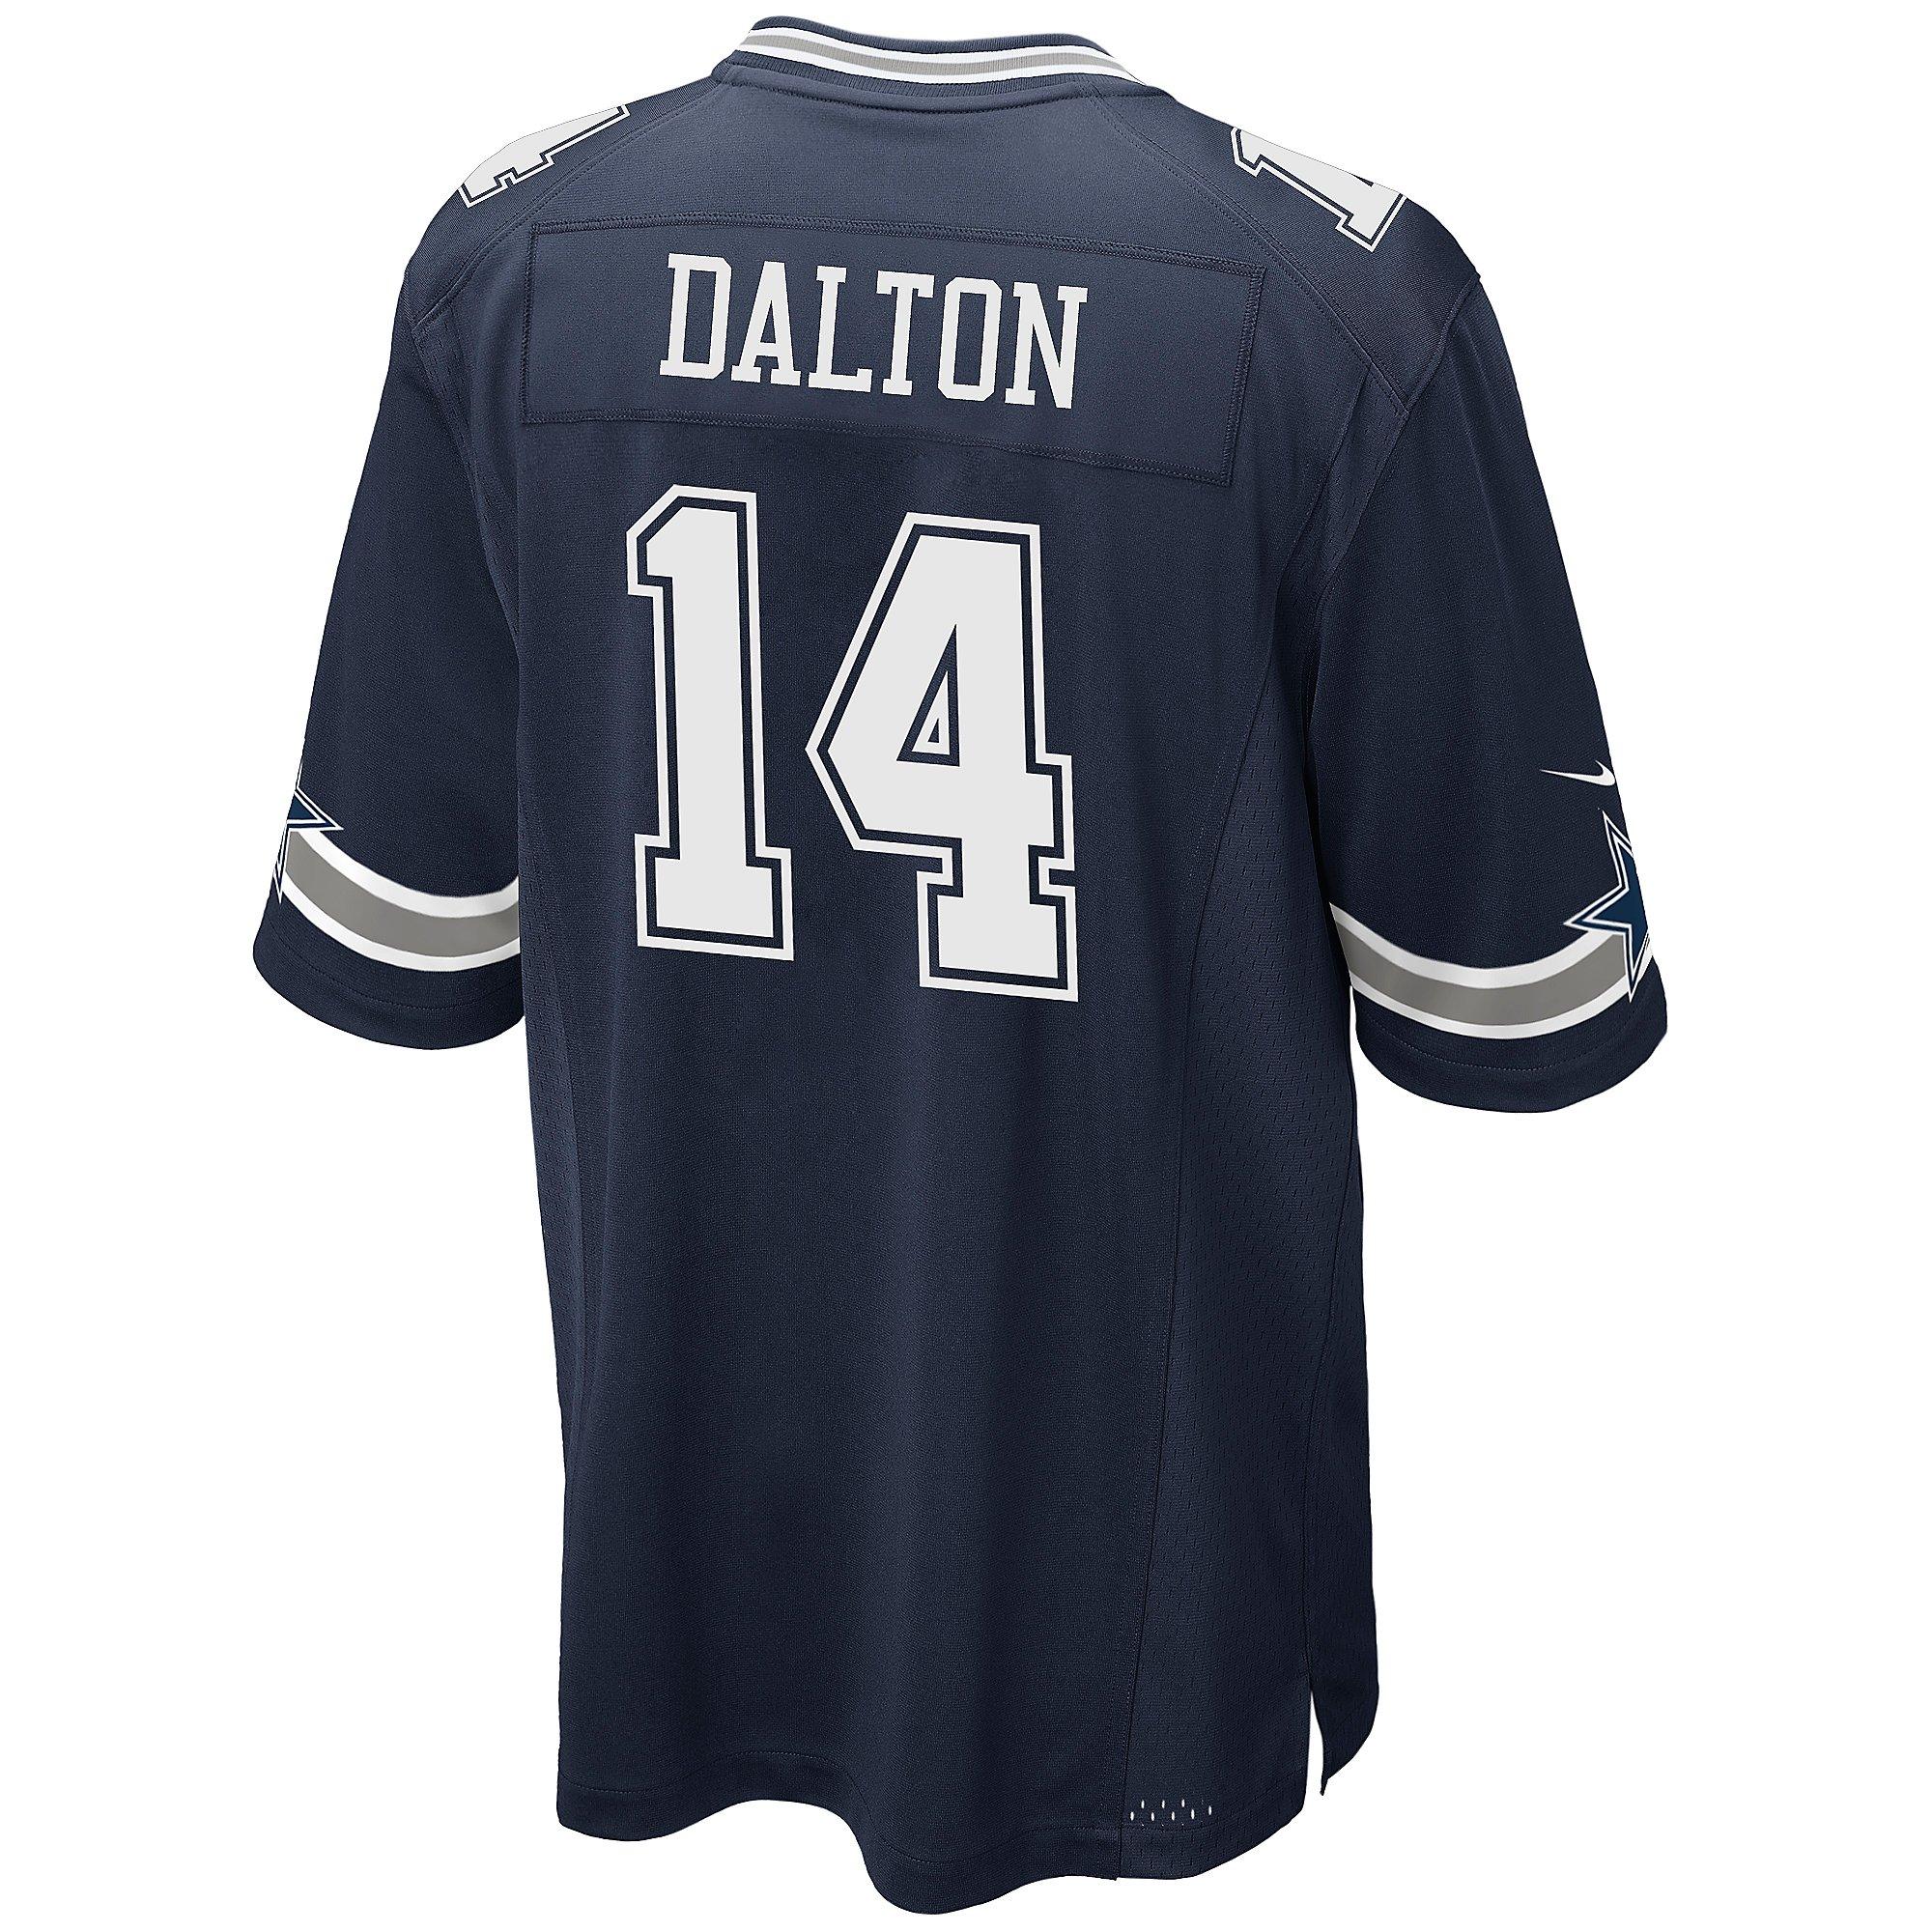 Dallas Cowboys Andy Dalton #14 Nike Navy Game Replica Jersey ...